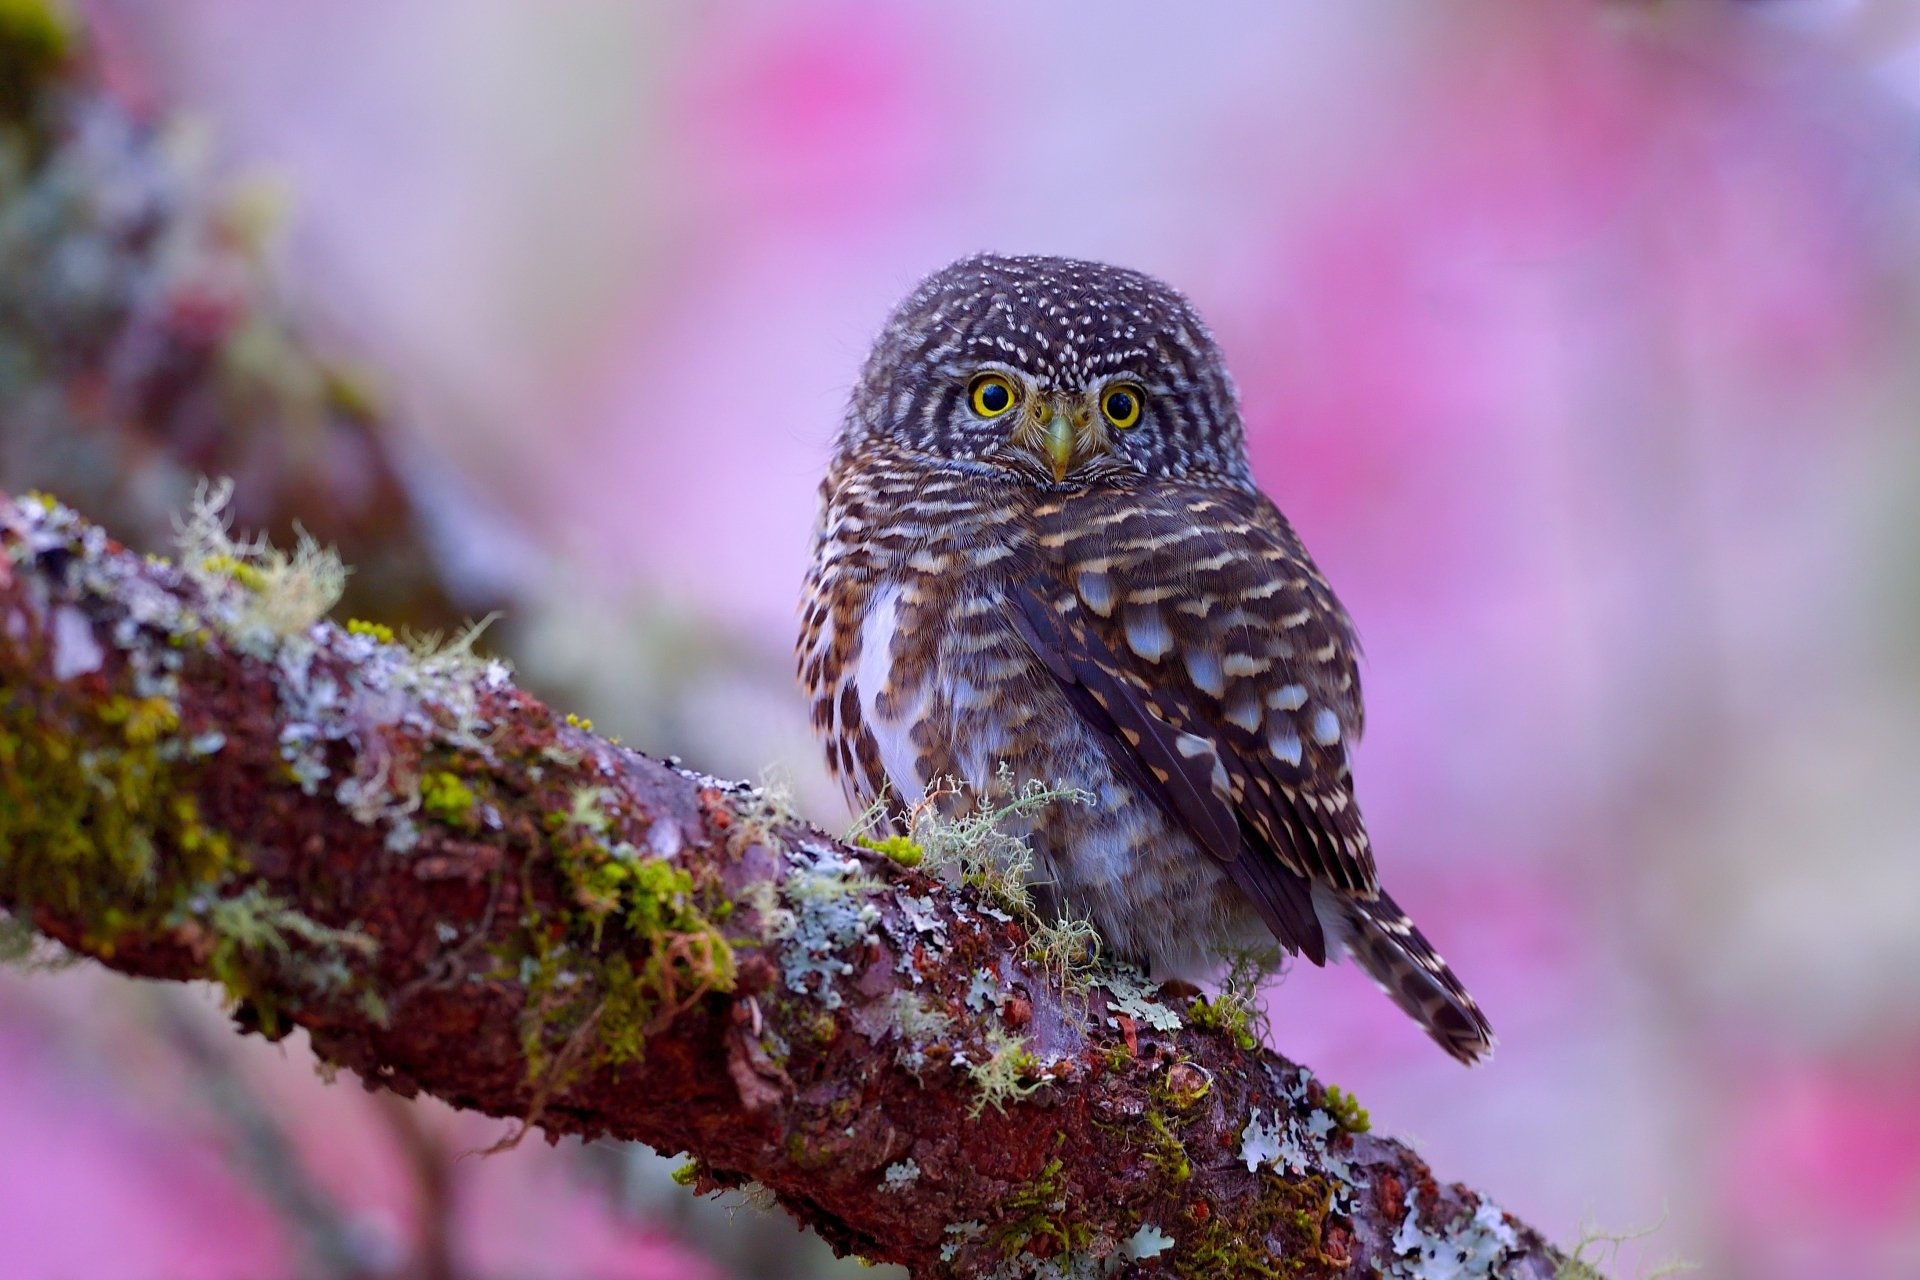 Owl 4k Ultra HD Wallpaper   Background Image   4372x2914 ...